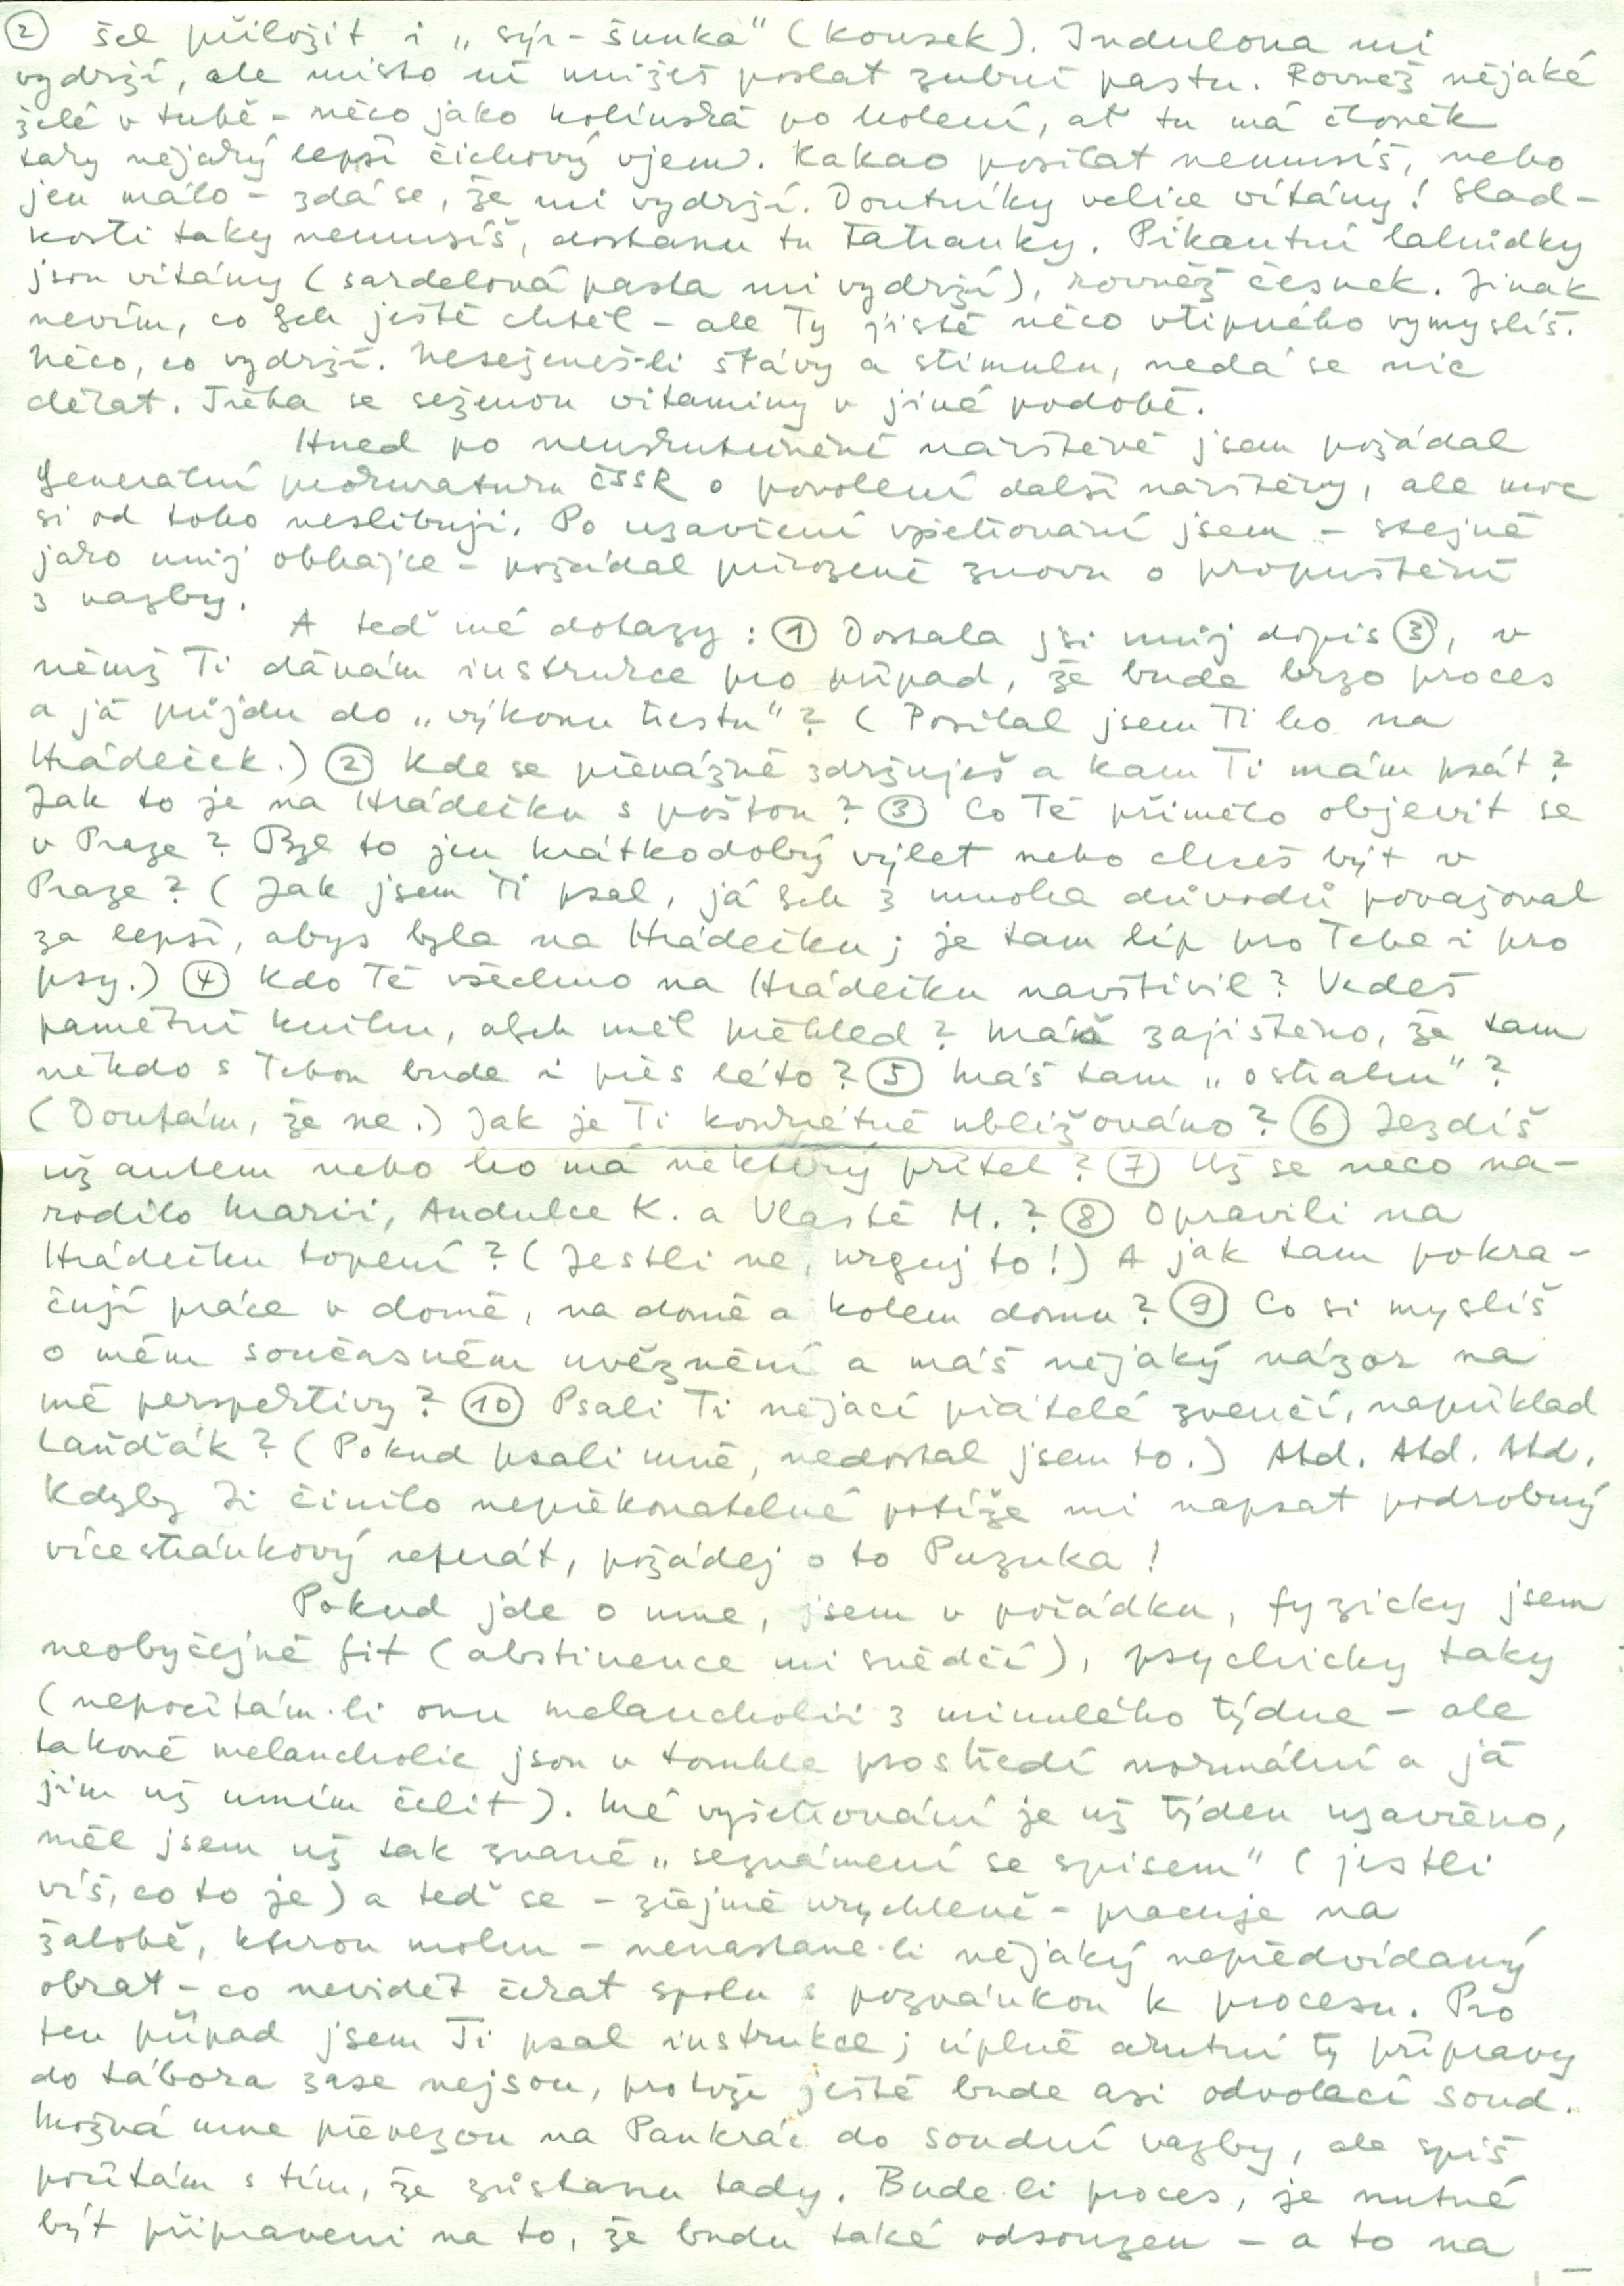 Václav Havel's letter to Olga Havlová, 8 July 1979